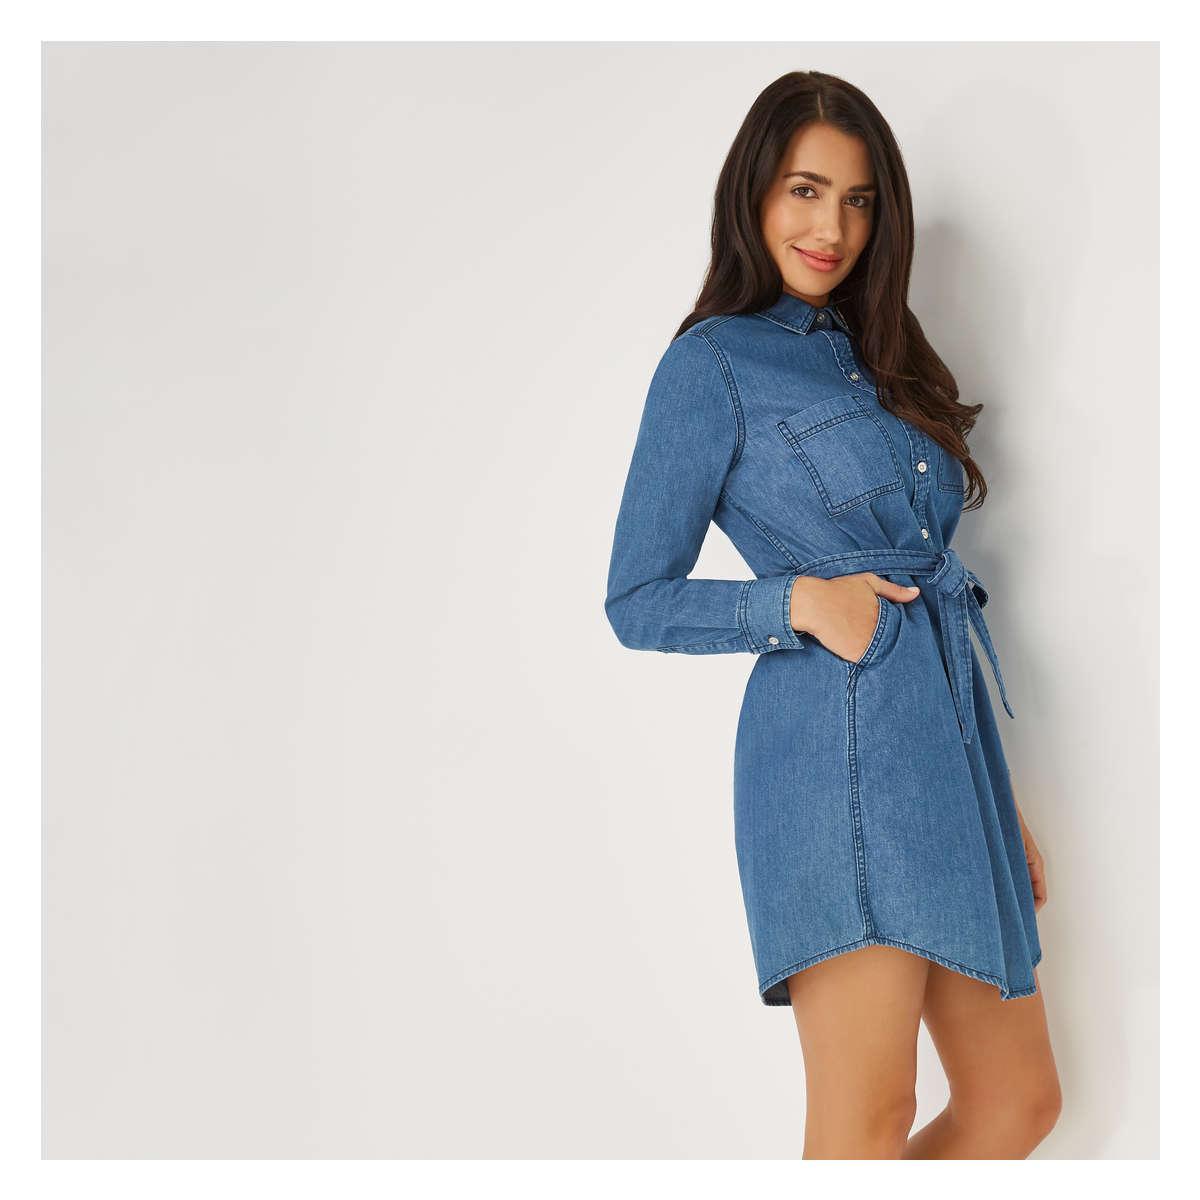 e1d4bfae795 Joe Fresh - Blue Denim Shirt Dress - Lyst. View fullscreen